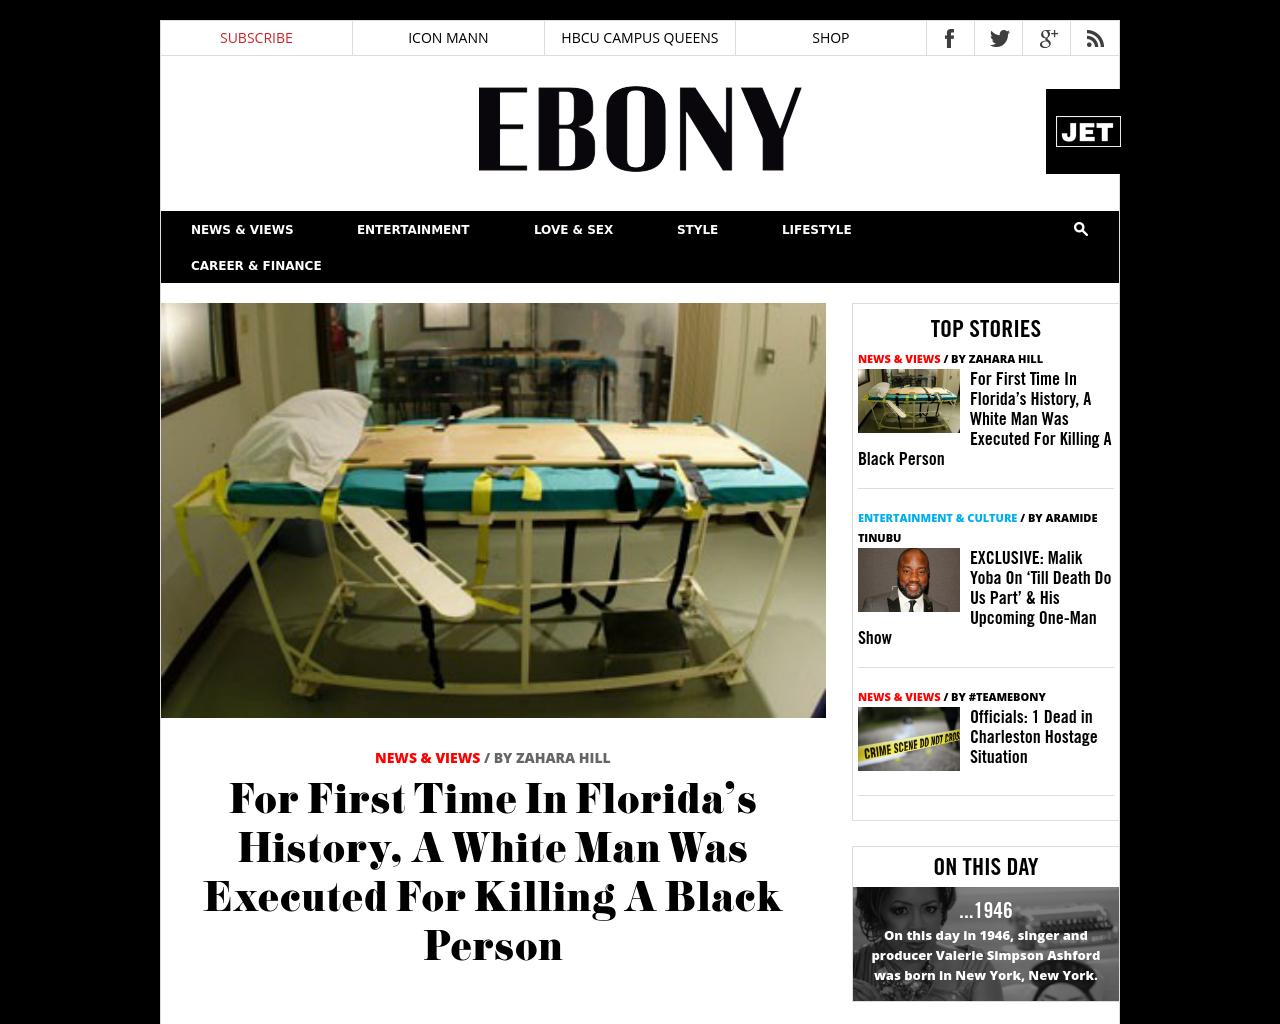 EBONY-Advertising-Reviews-Pricing